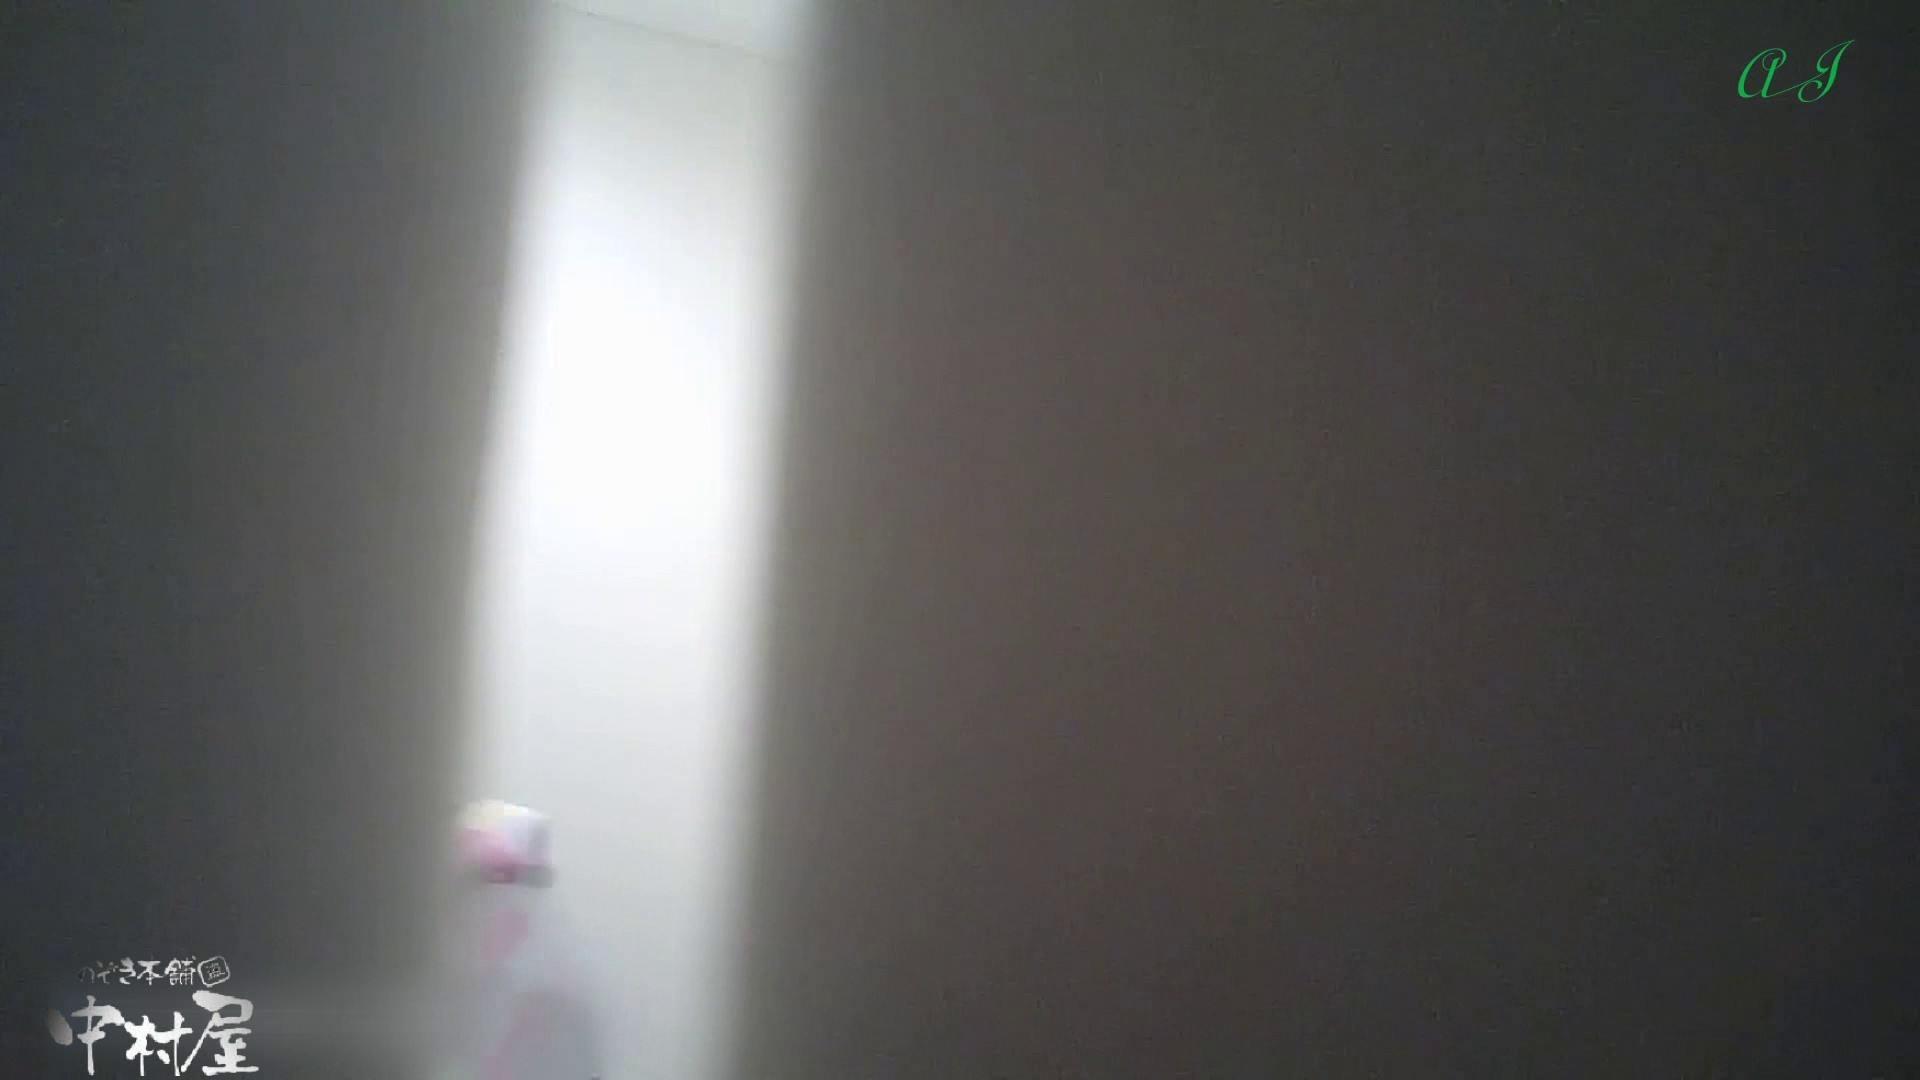 大あり美JDトイレ盗satu【有名大学女性洗面所 vol.80】 洗面所 | 0  67連発 61